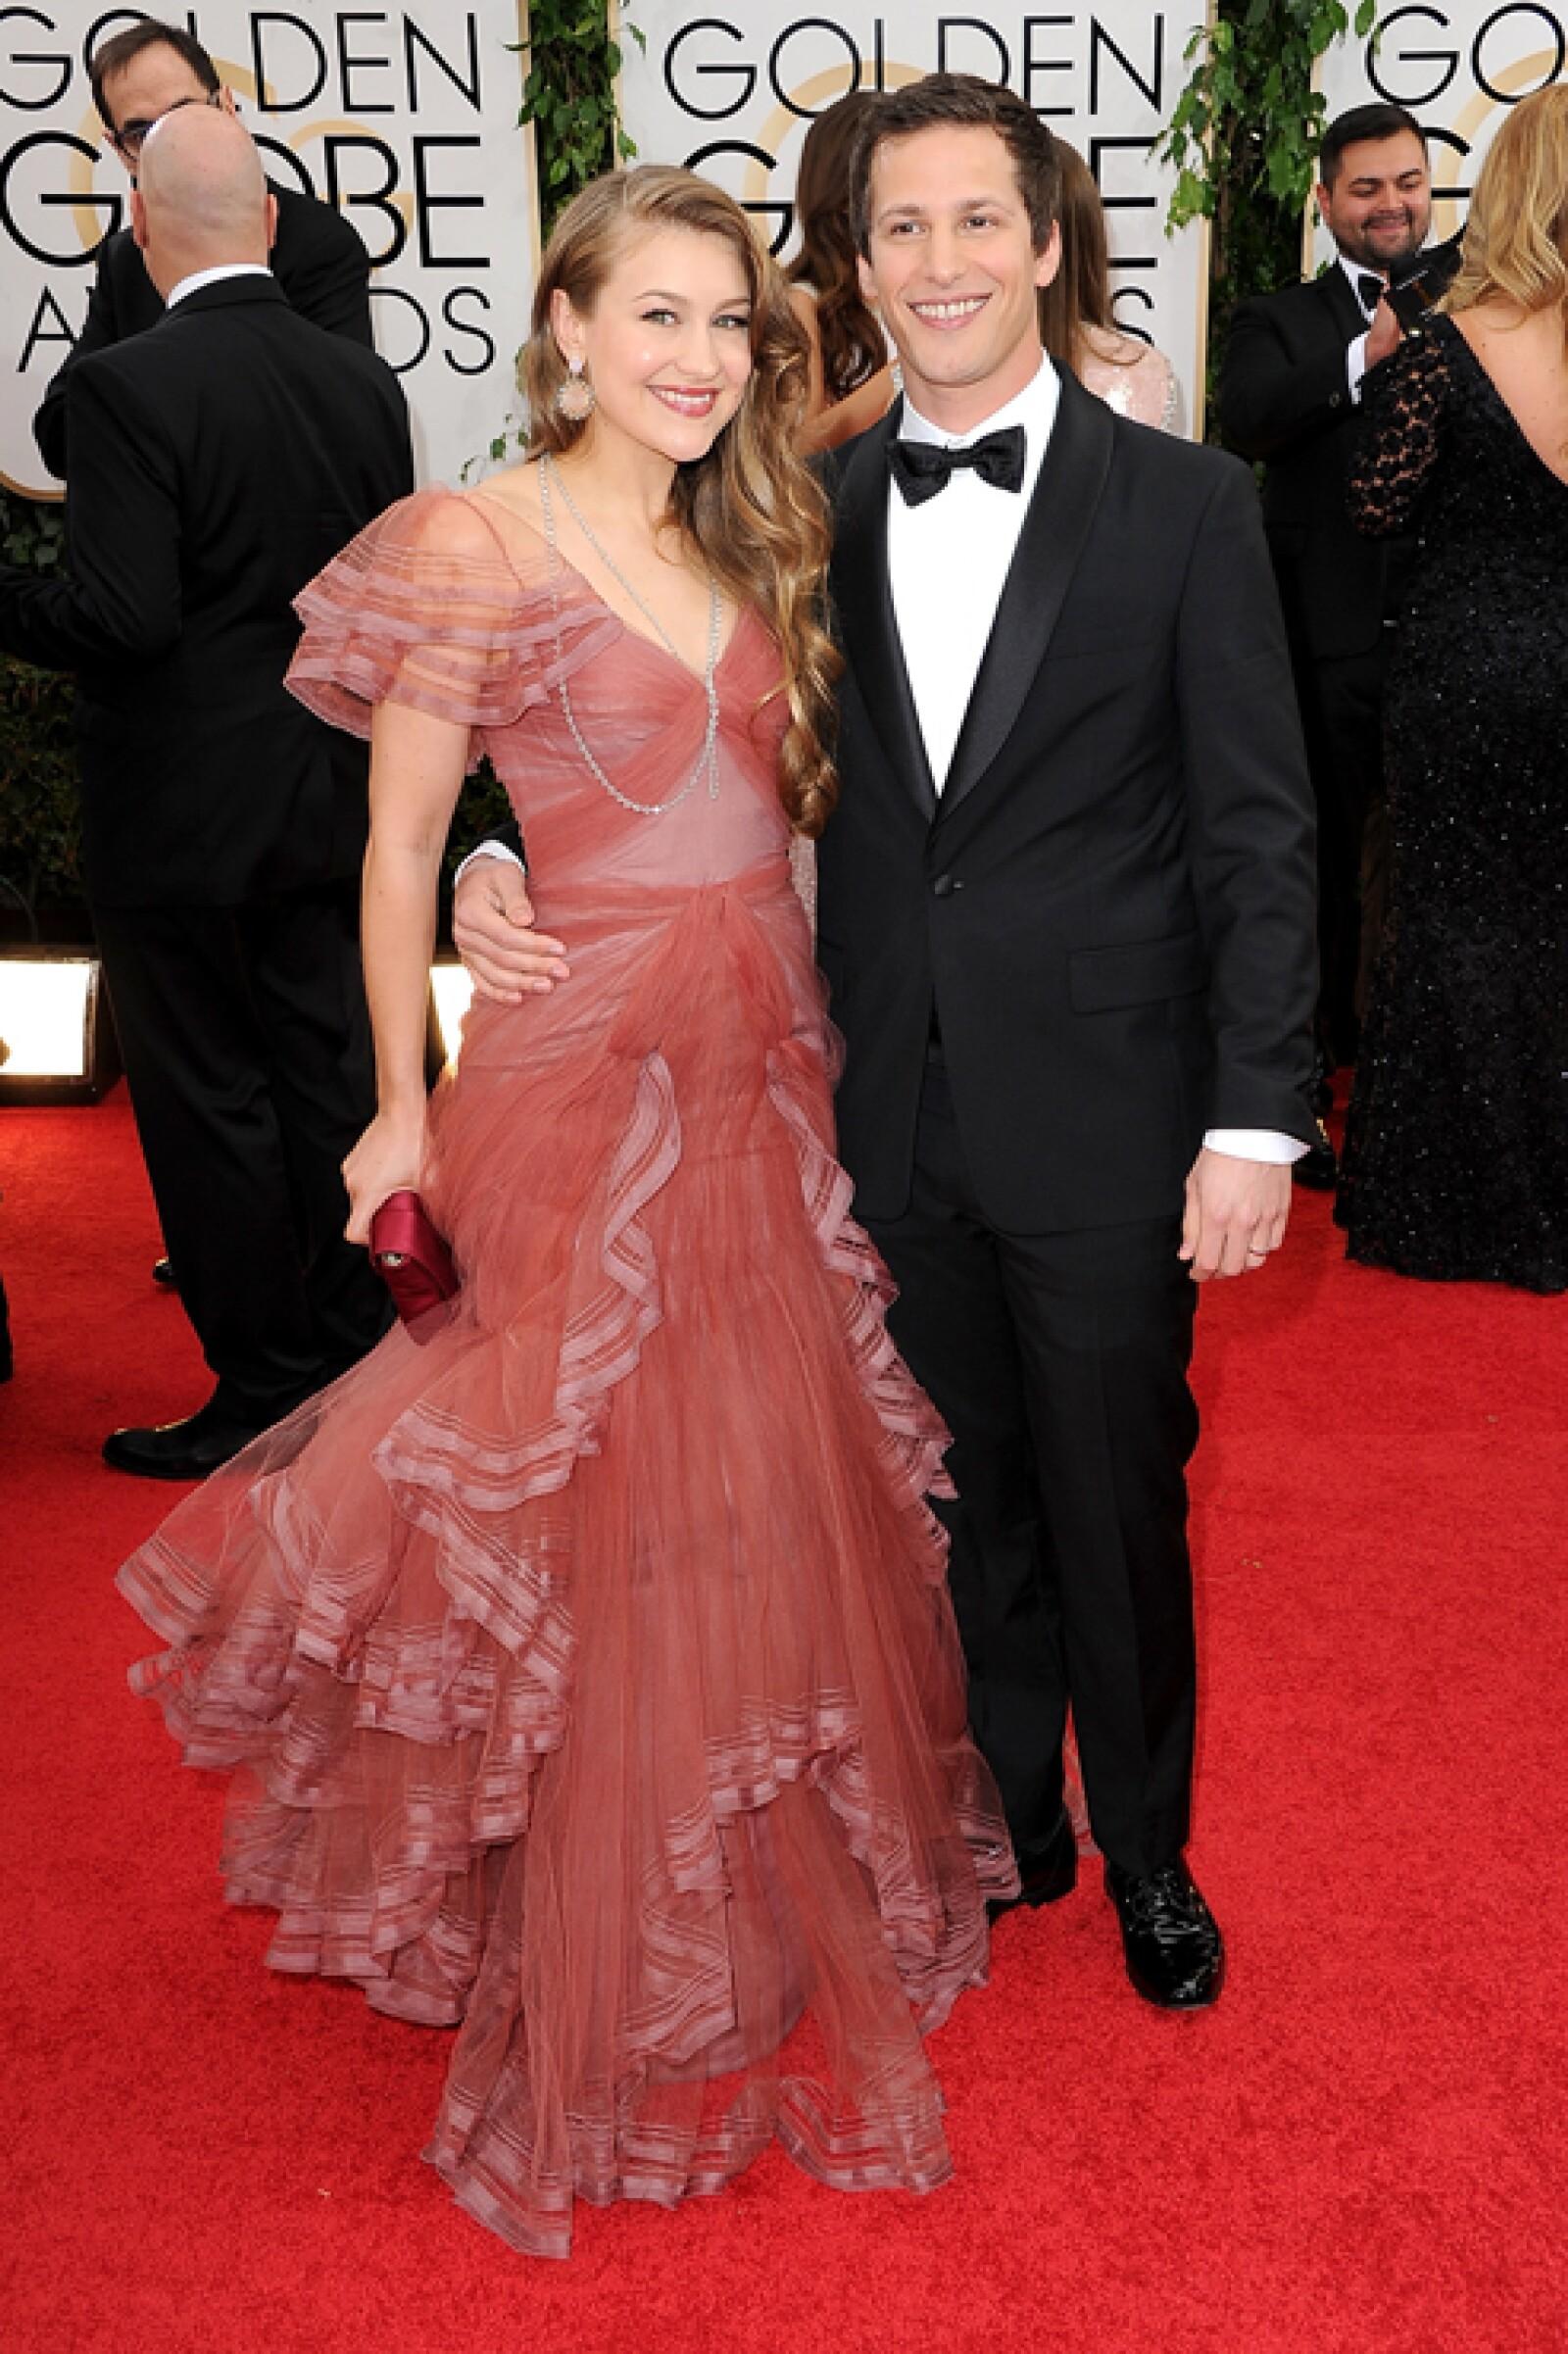 Andy Samberg llegó acompañado de su nueva esposa Joanna Newsom